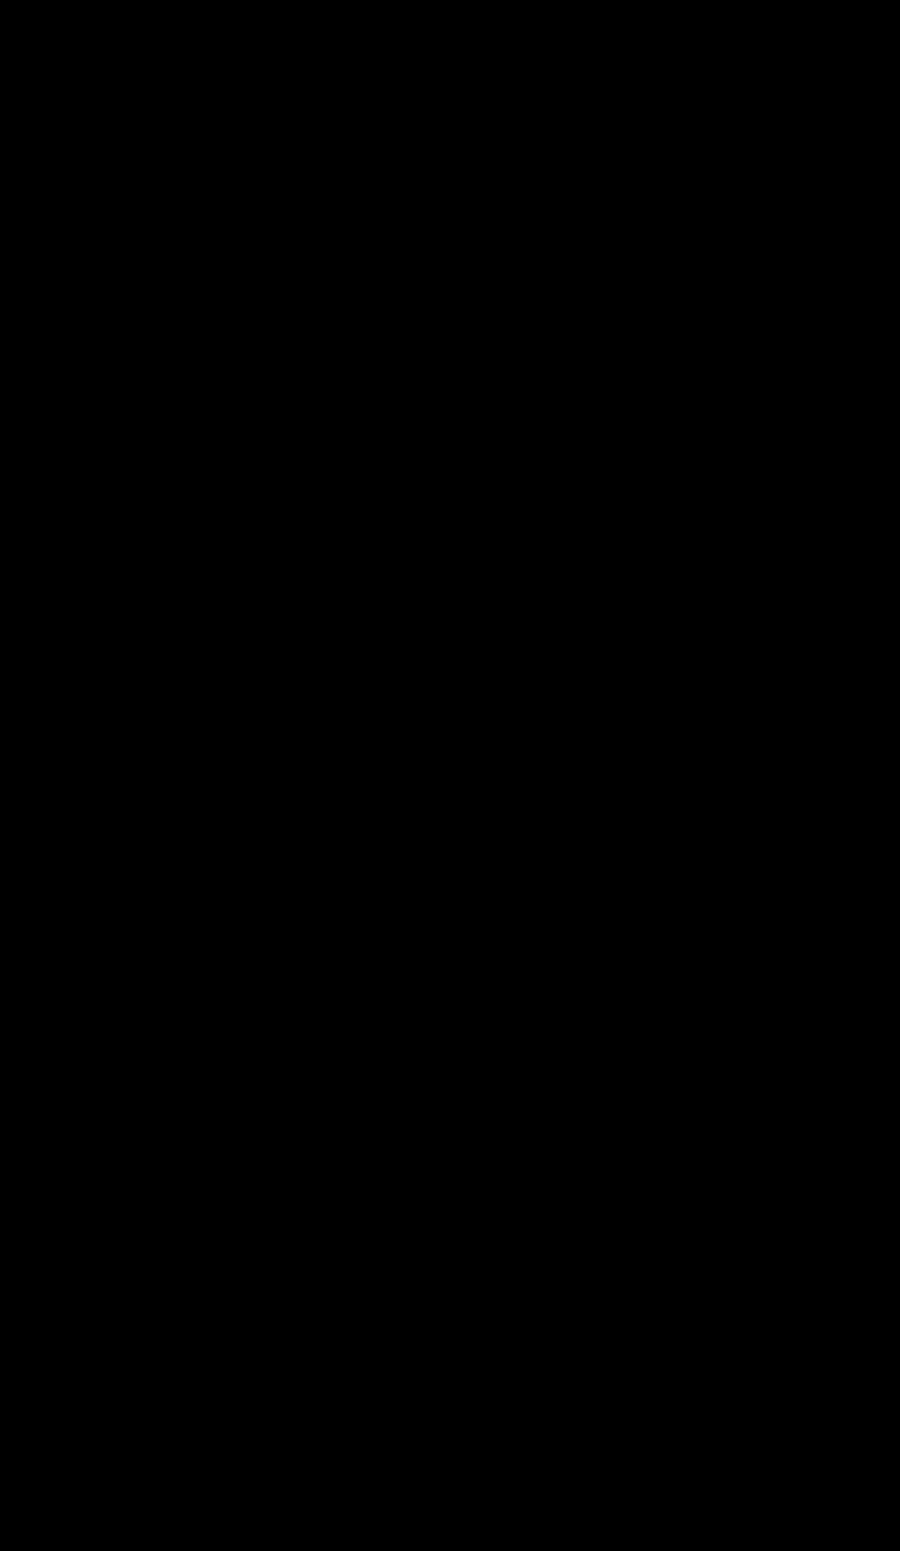 goku ssj4 chibi lineart by maffo1989 on deviantart